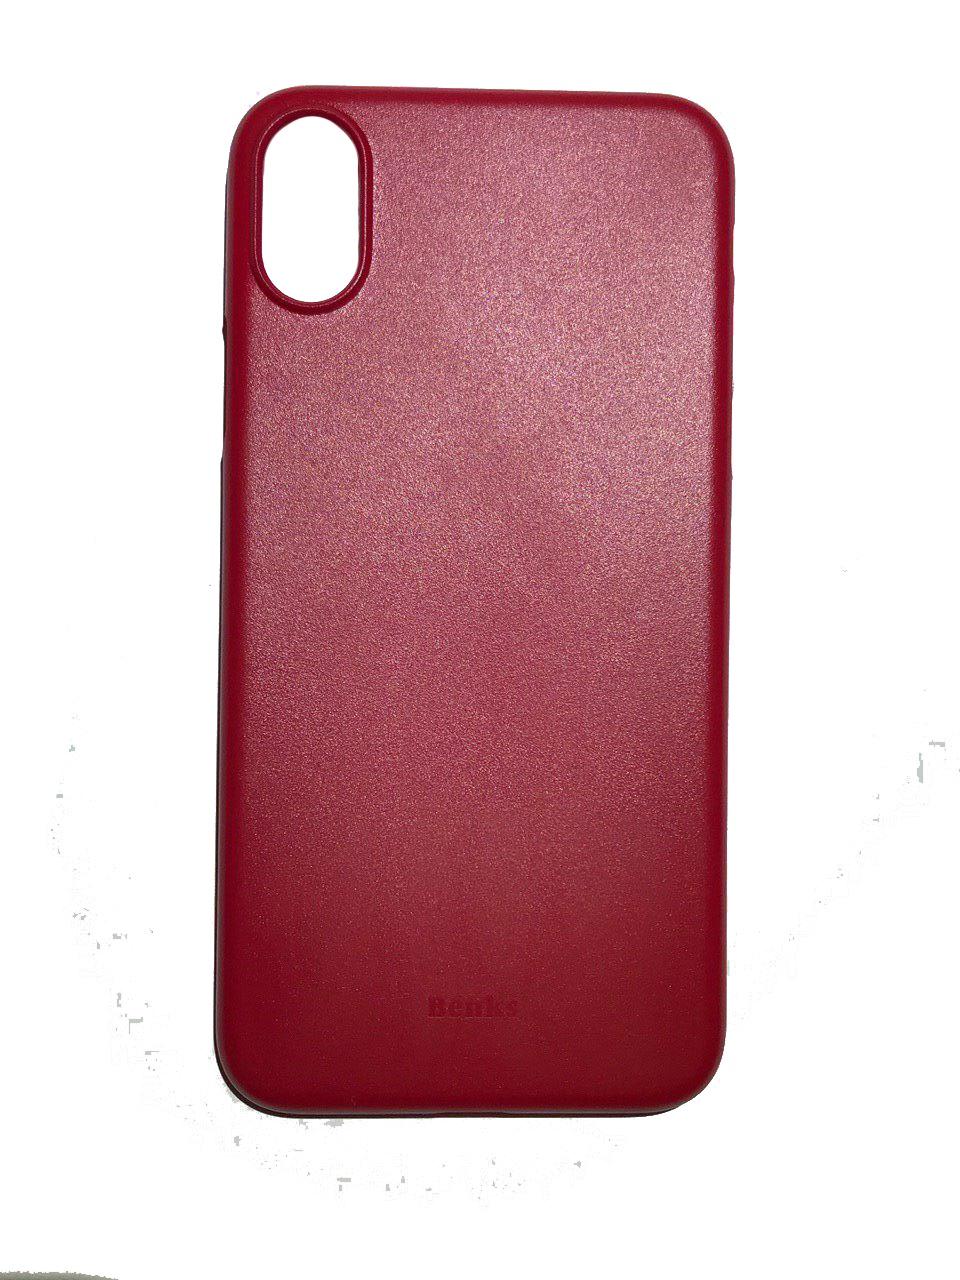 Чехол для сотового телефона Benks Чехол for iPhone X пластик (Red), красный glare free screen protector with cleaning cloth for iphone 3g